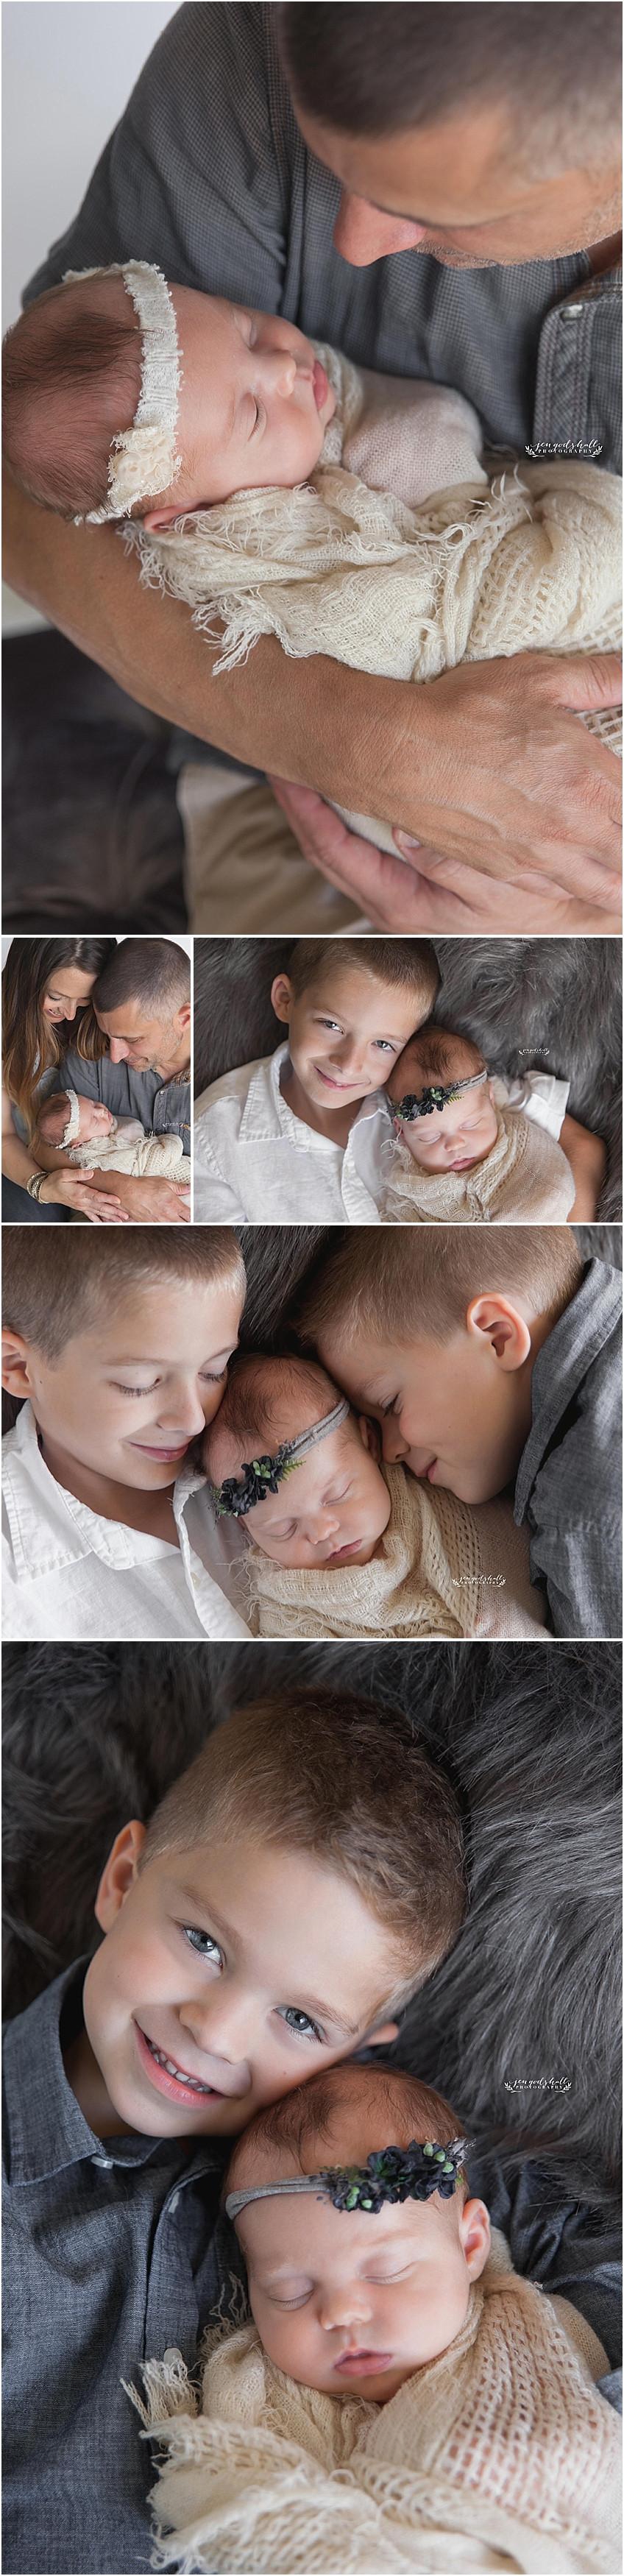 Newborn baby and family session by Sarasota Newborn Photographer Jen Godshall